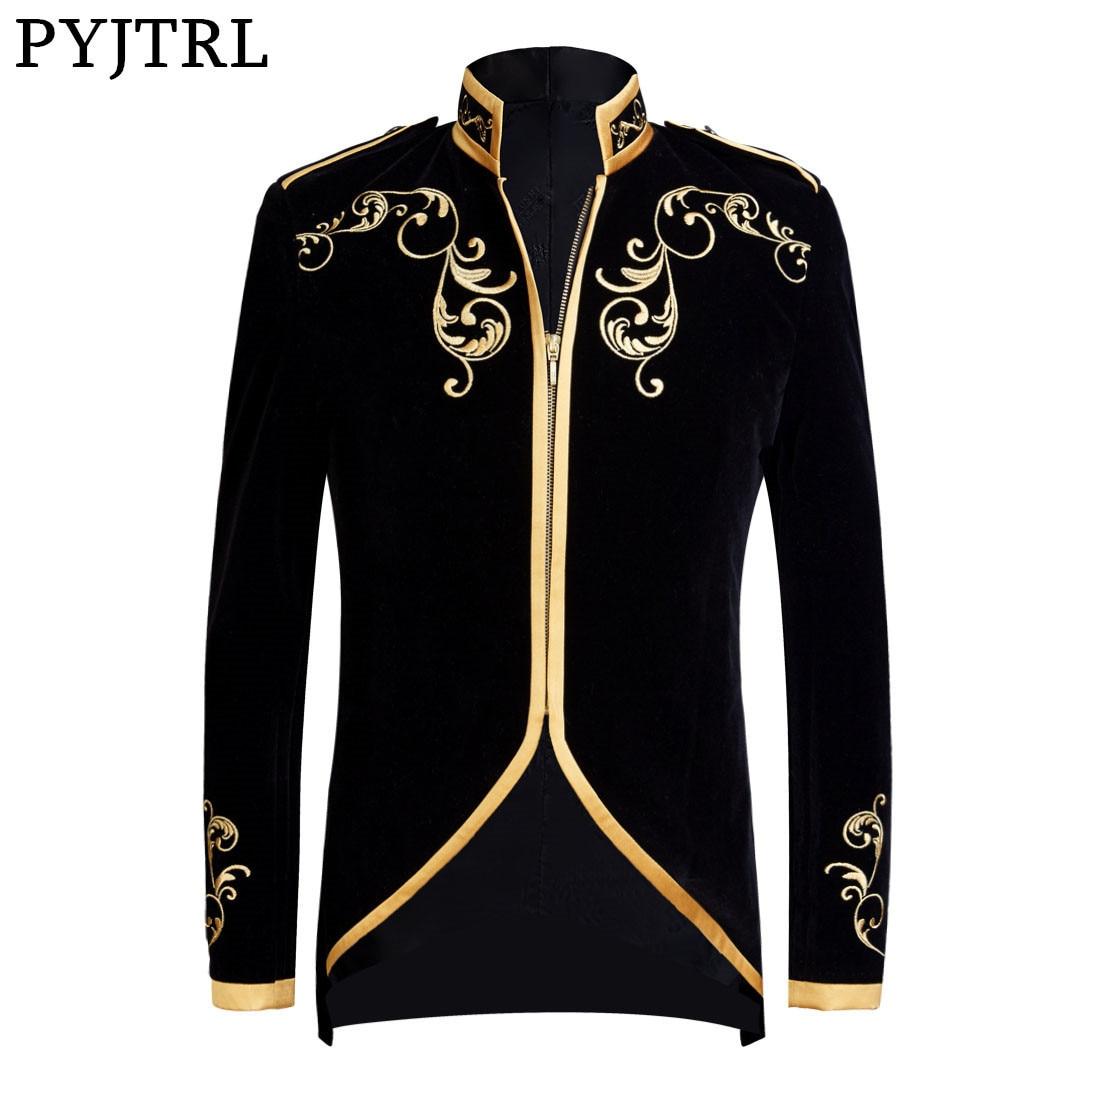 PYJTRL British Style Palace Prince Fashion Black Velvet Gold Embroidery Blazer Wedding Groom Slim Fit Suit